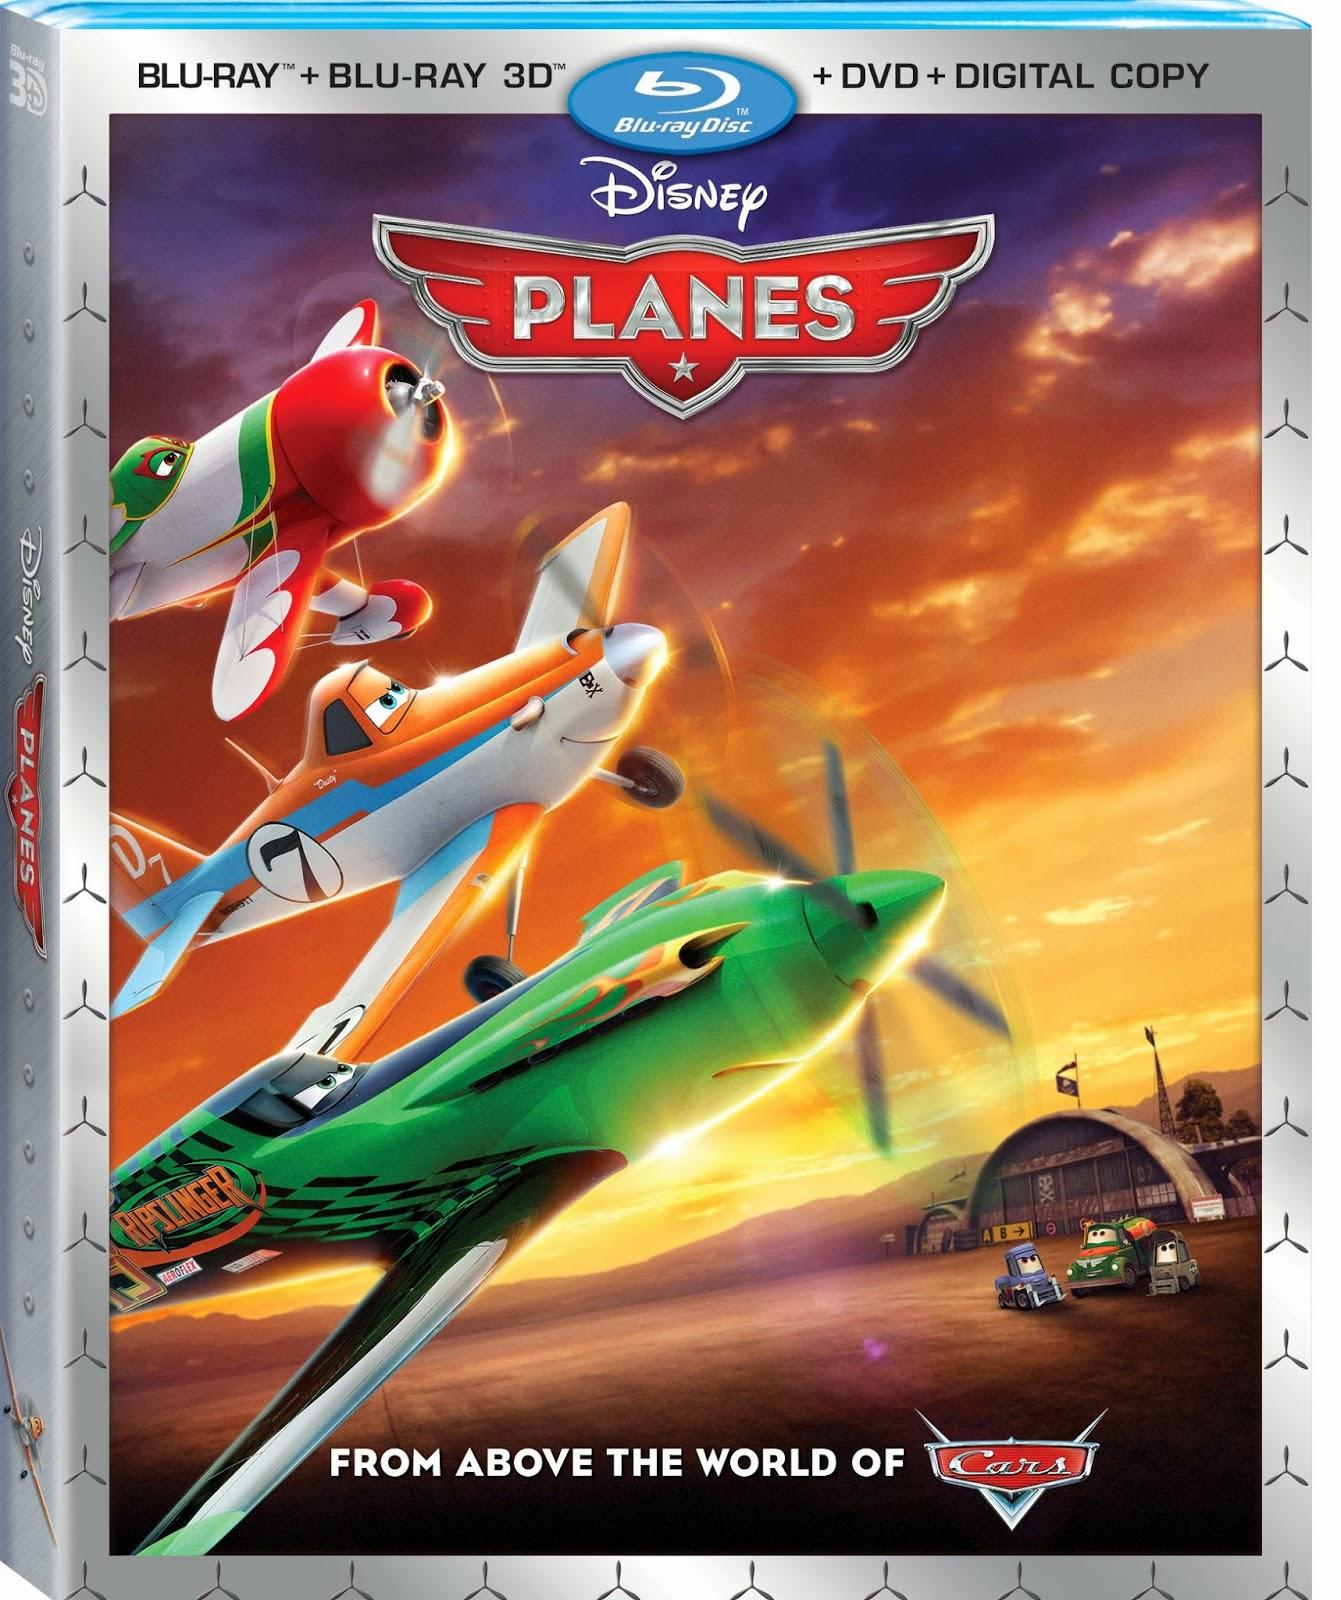 Planes [2013] - Animation